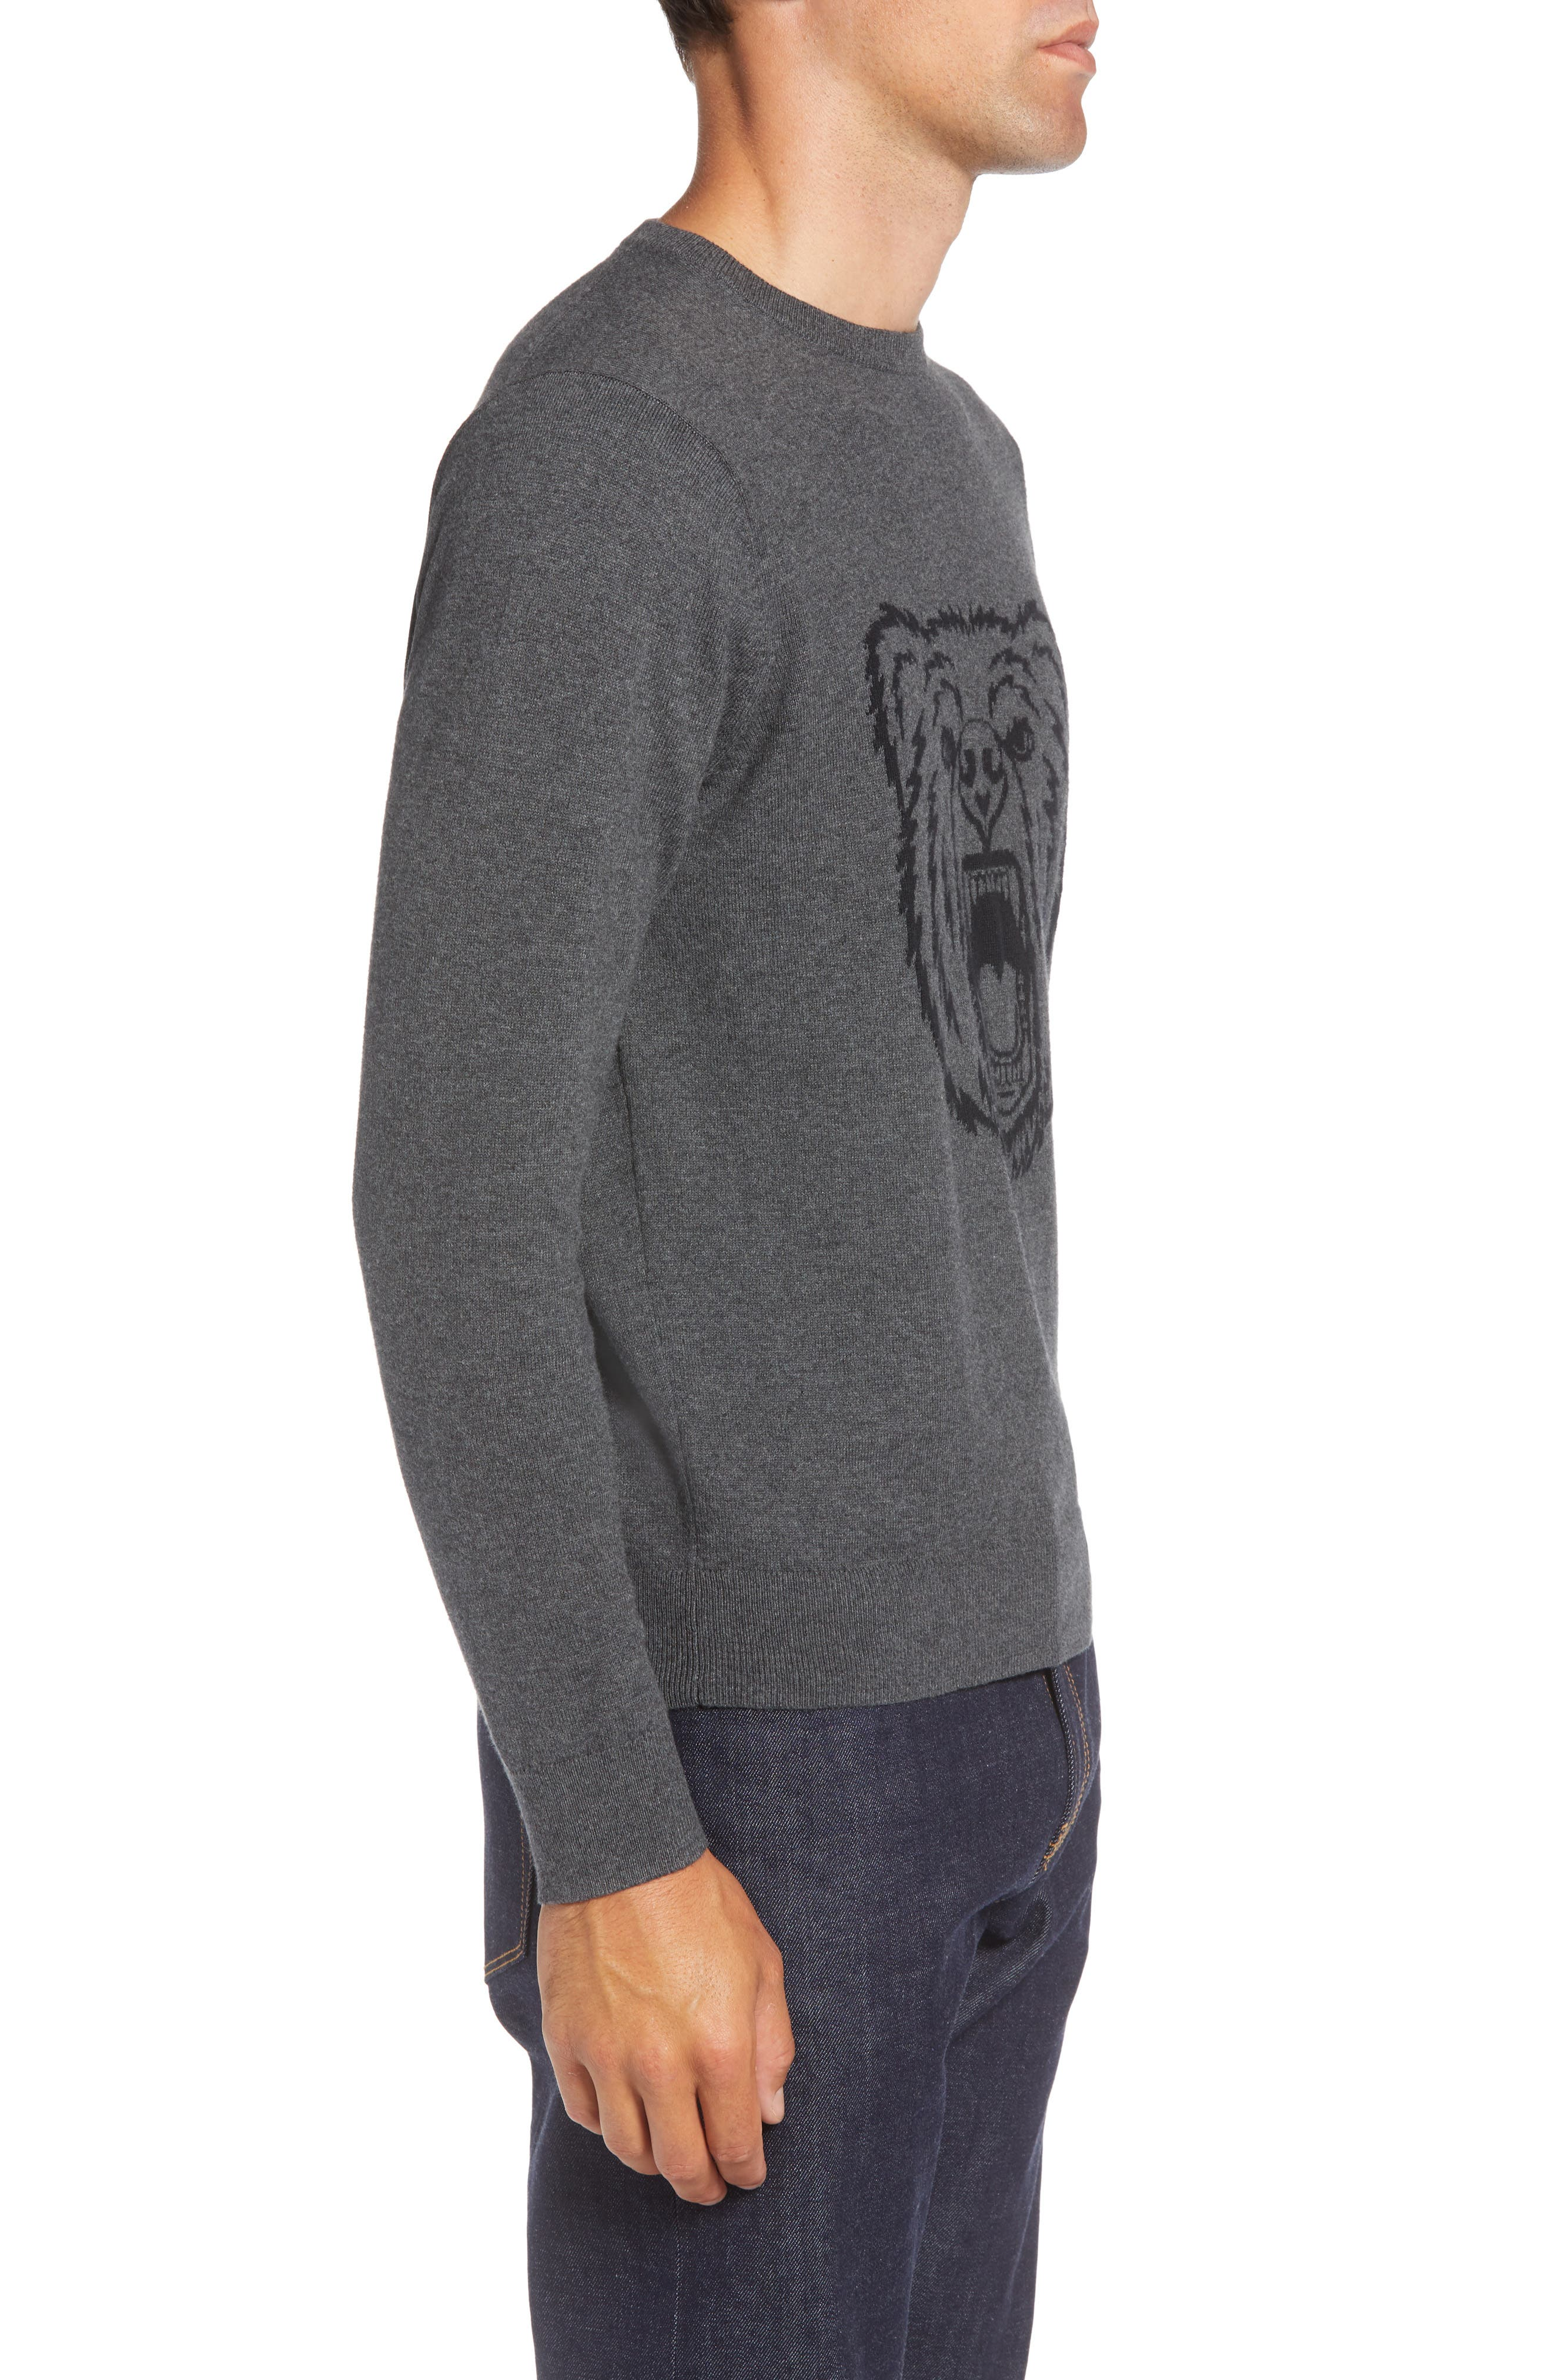 Bear Crewneck Sweater,                             Alternate thumbnail 3, color,                             GREY CASTLEROCK MARL BEAR